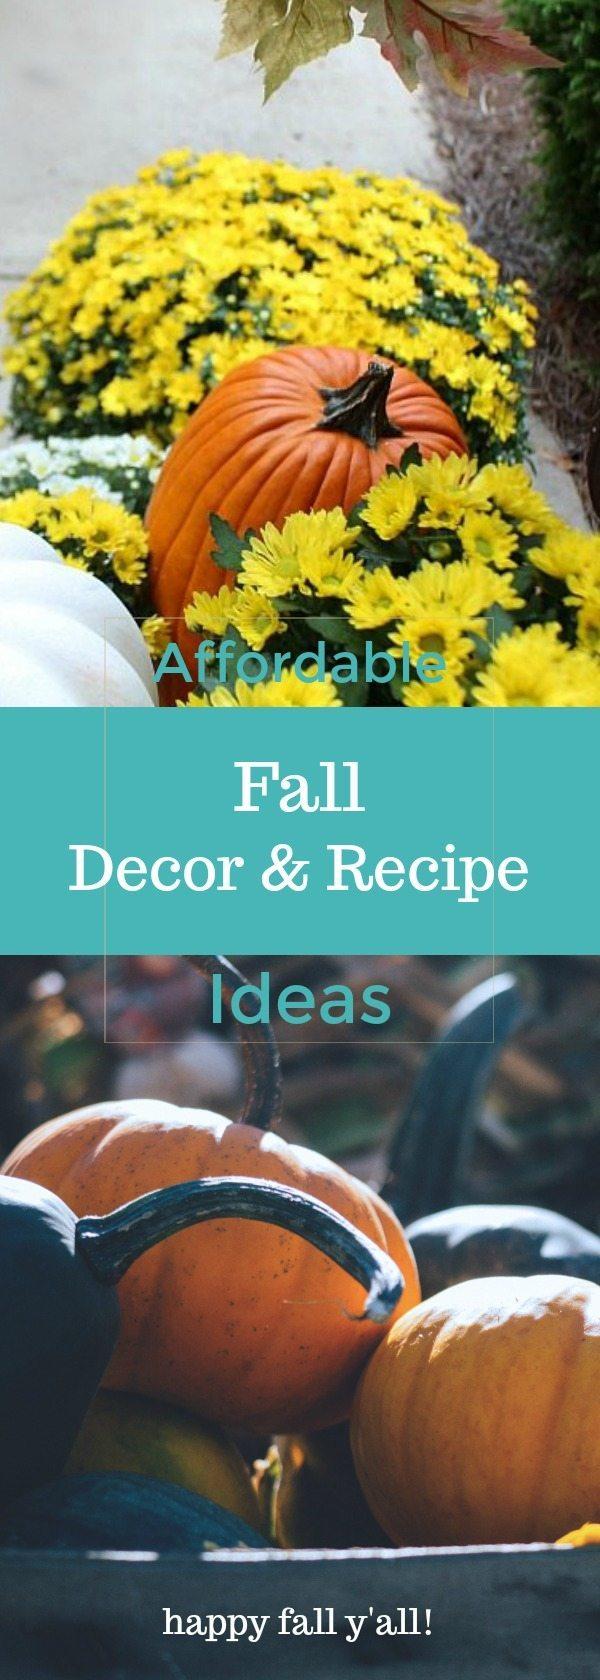 Affordable Fall Decor & Recipes Ideas